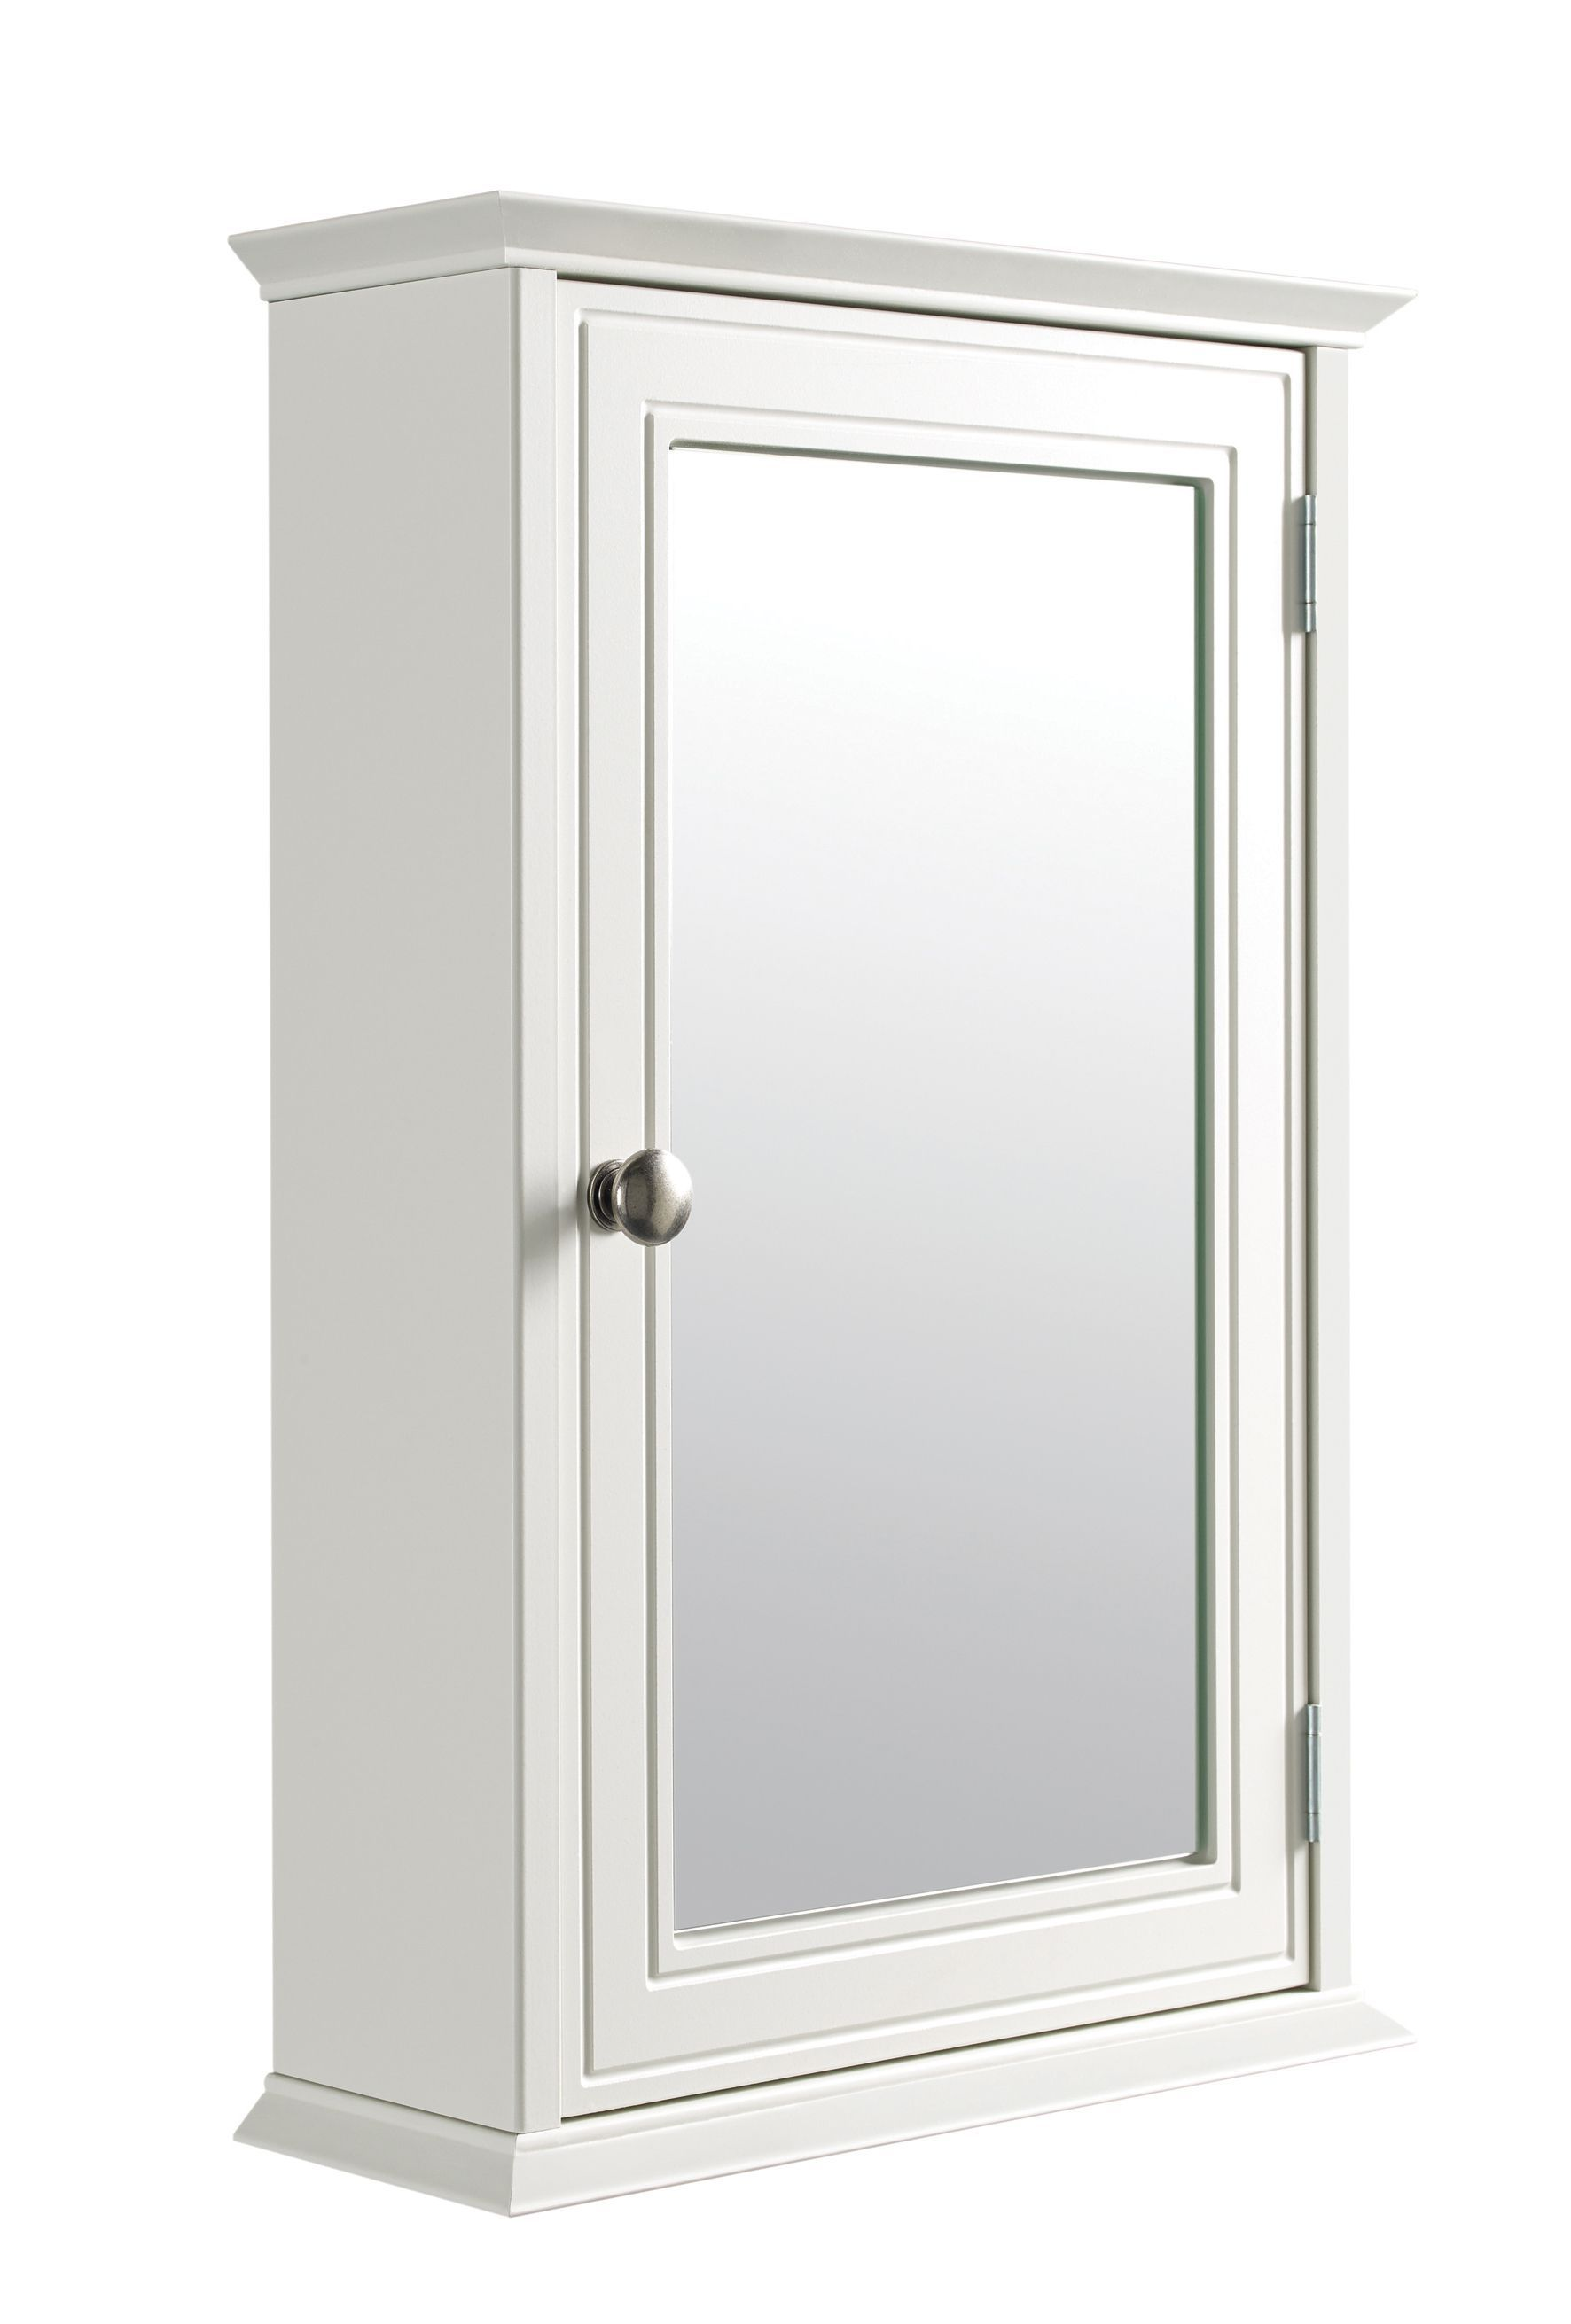 Cooke & Lewis Romano Single Door White Mirror Cabinet  Departments  Diy  At B&q